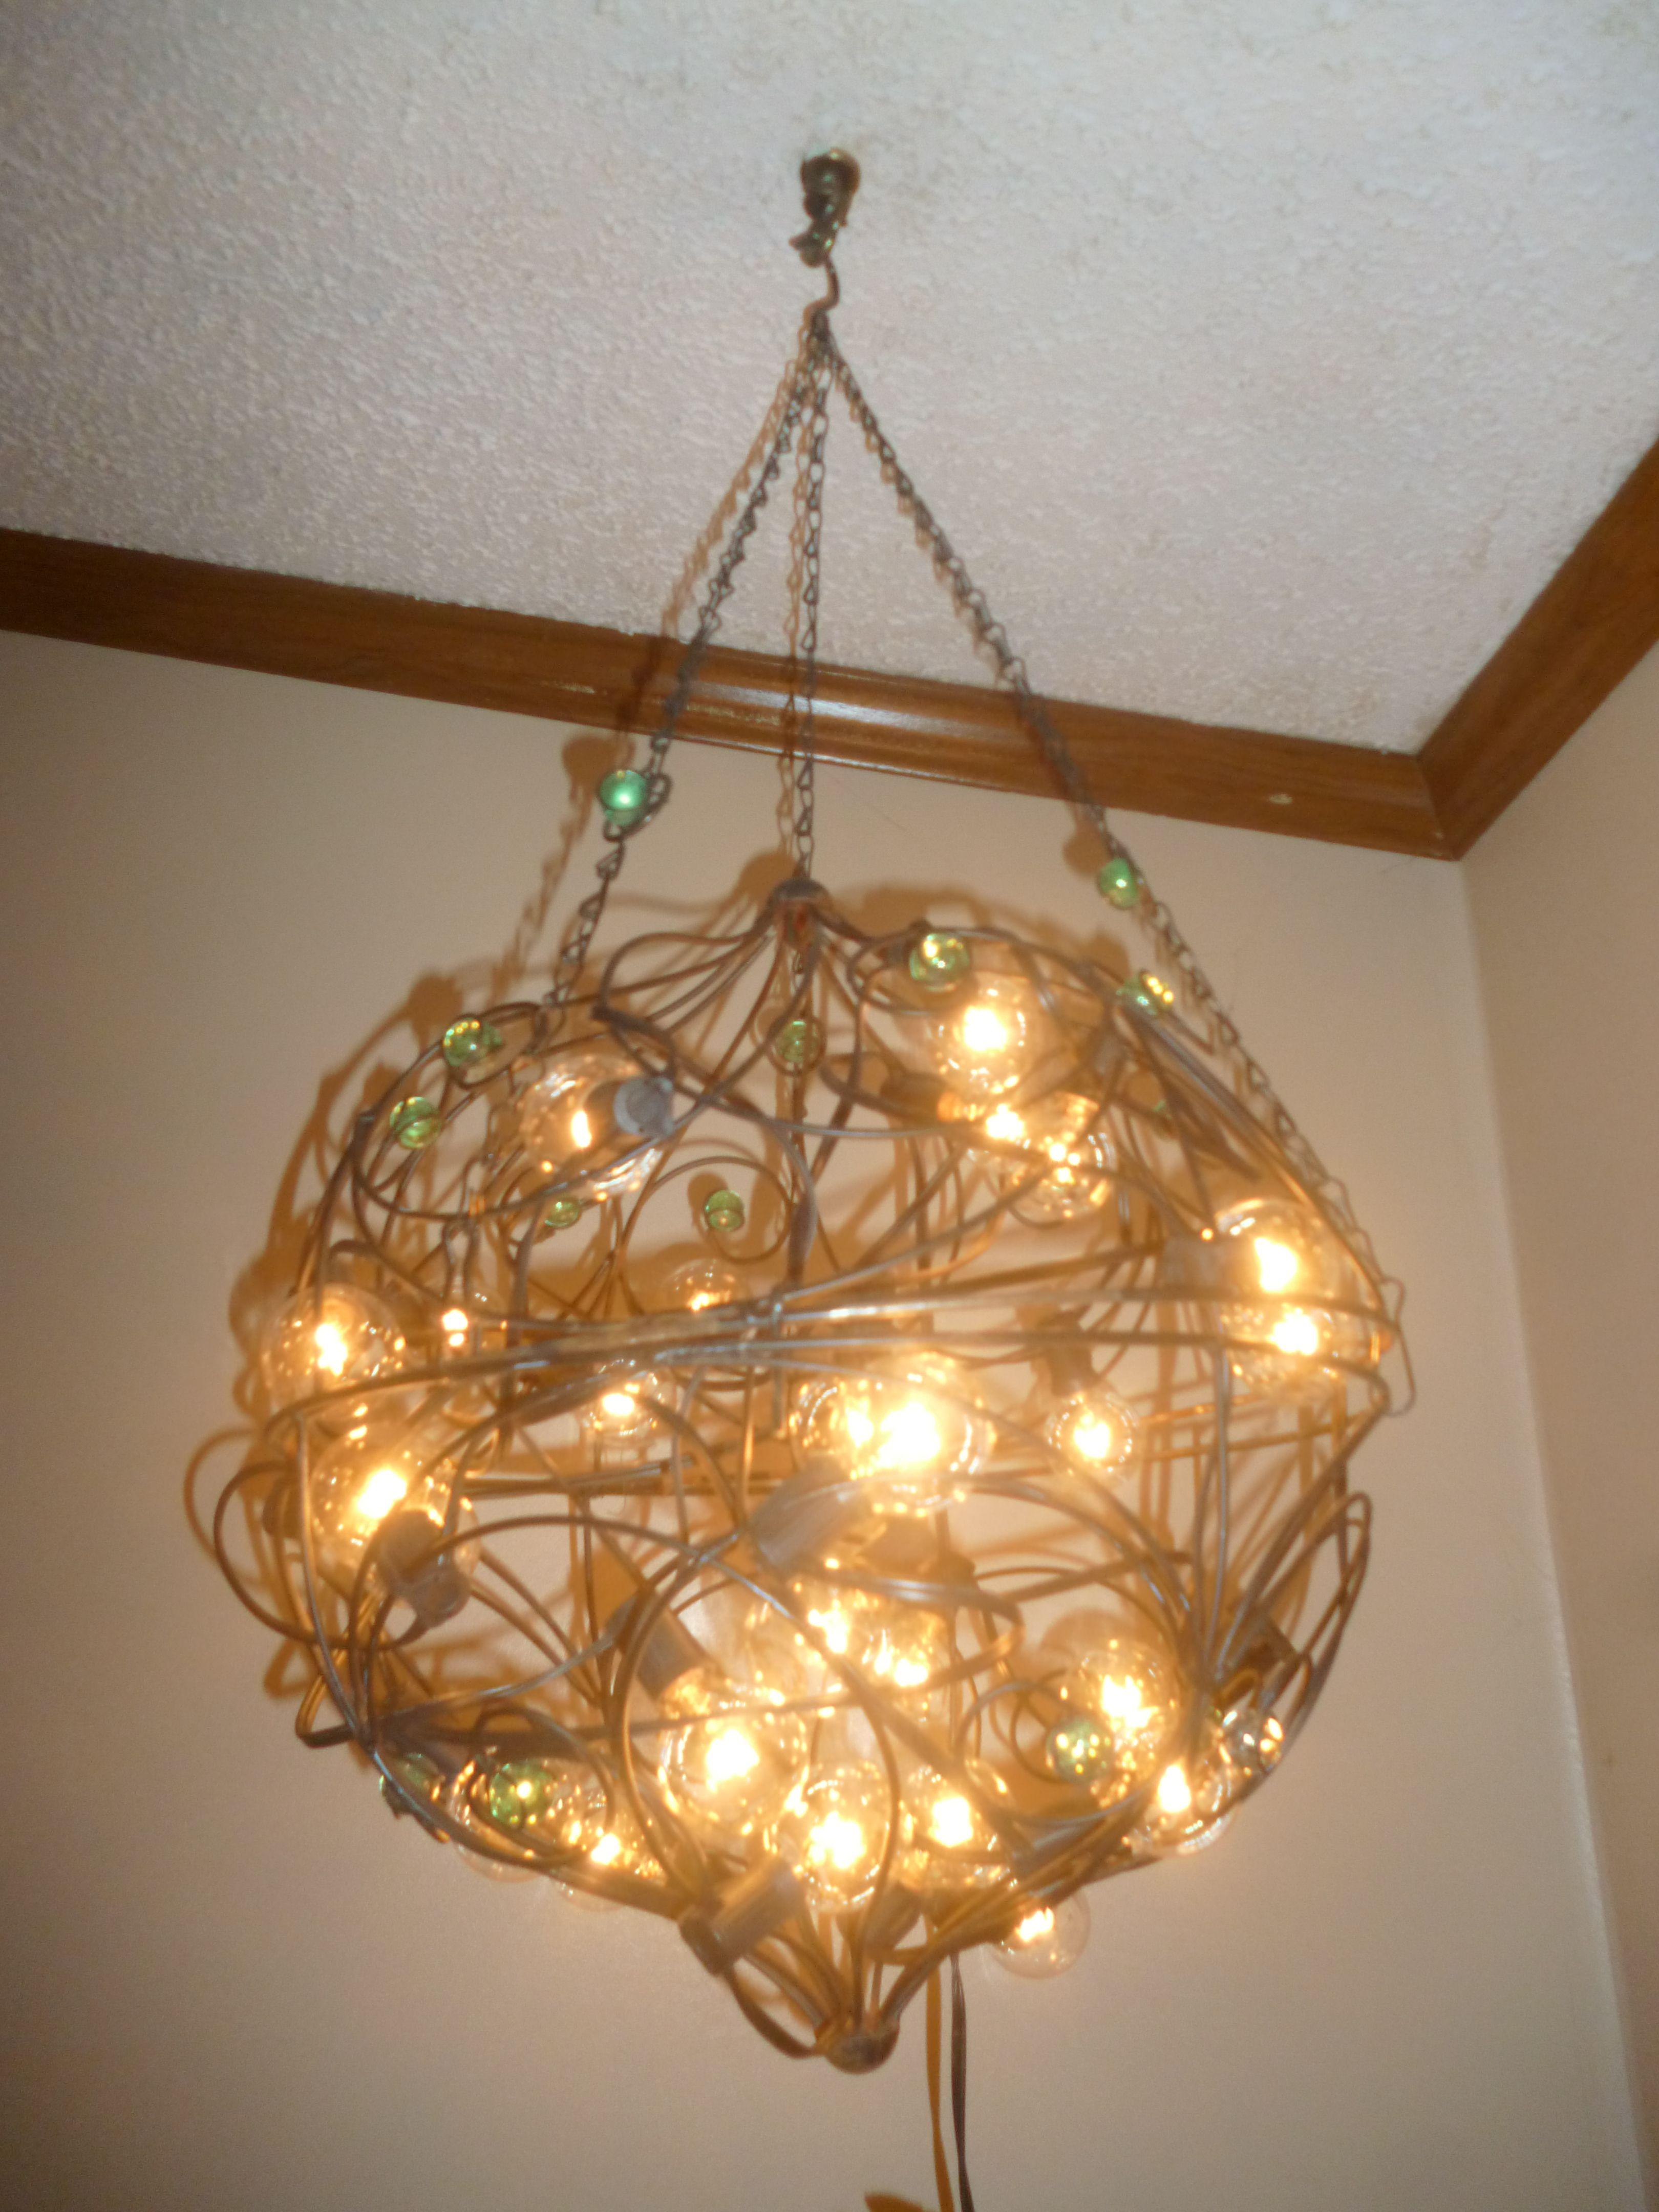 Vintage wire basket chandelier I made. | DIY wire basket ...